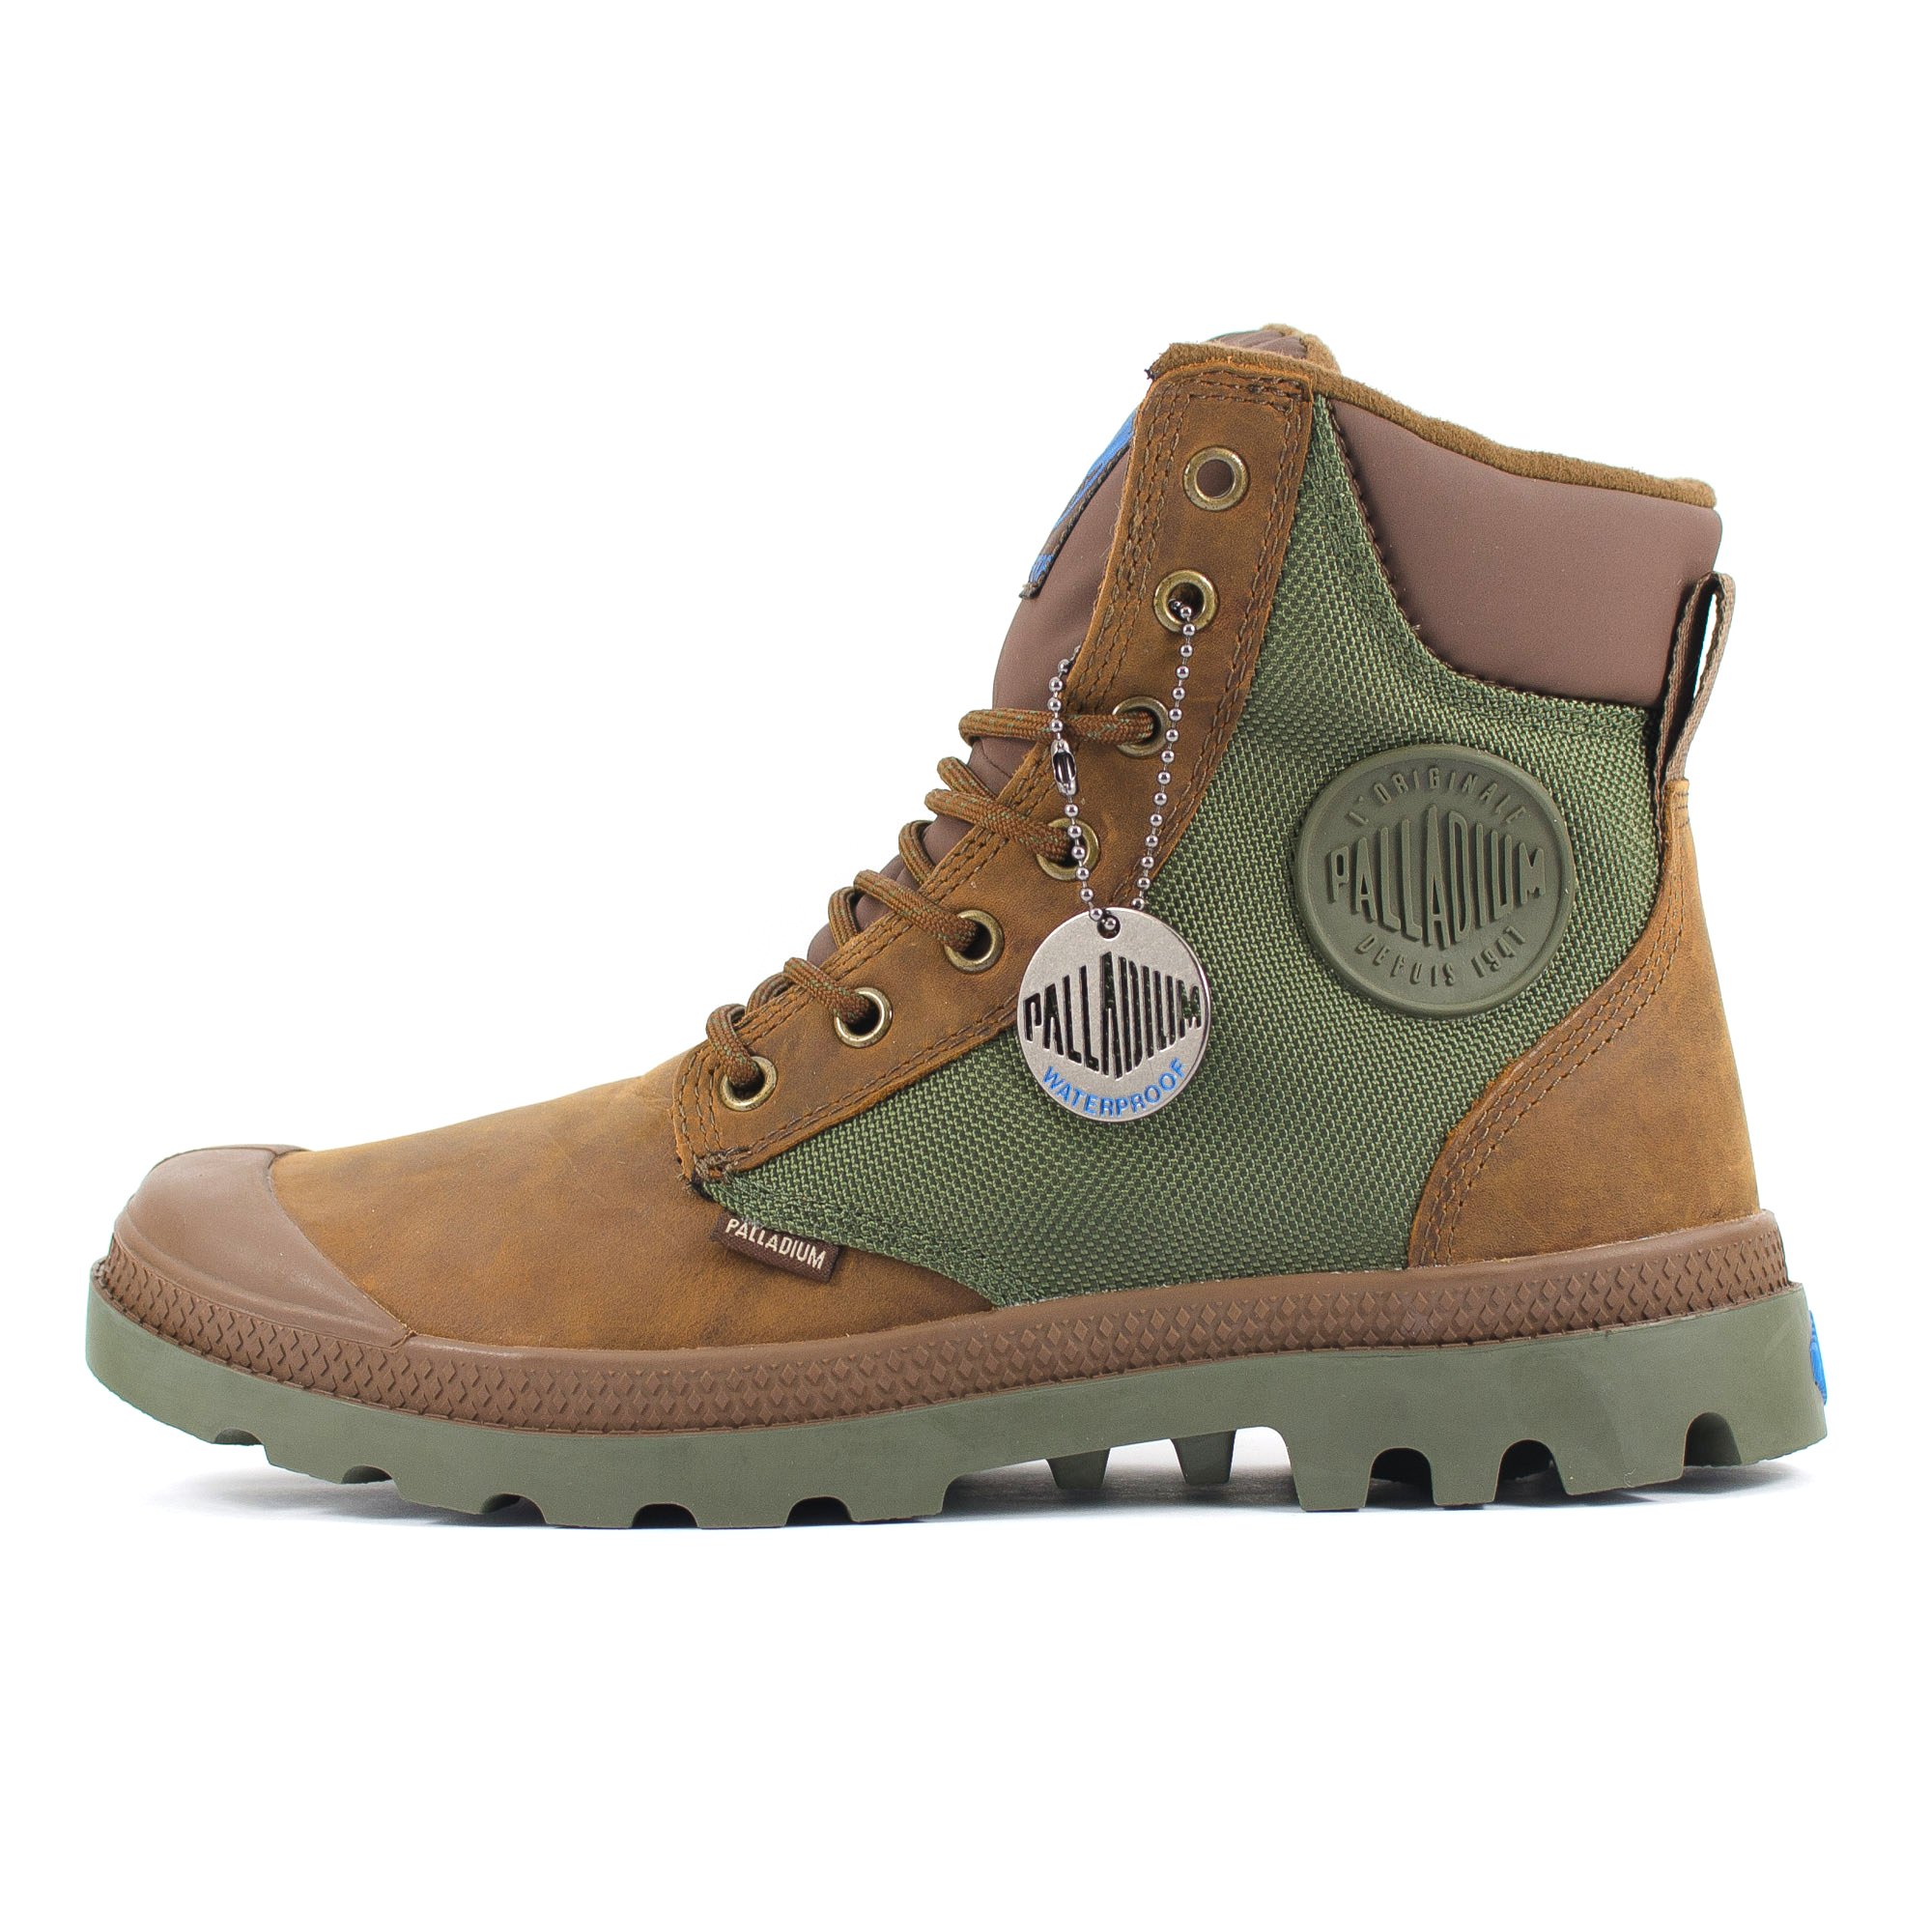 palladium pa sport cuff waterproof brown green leather